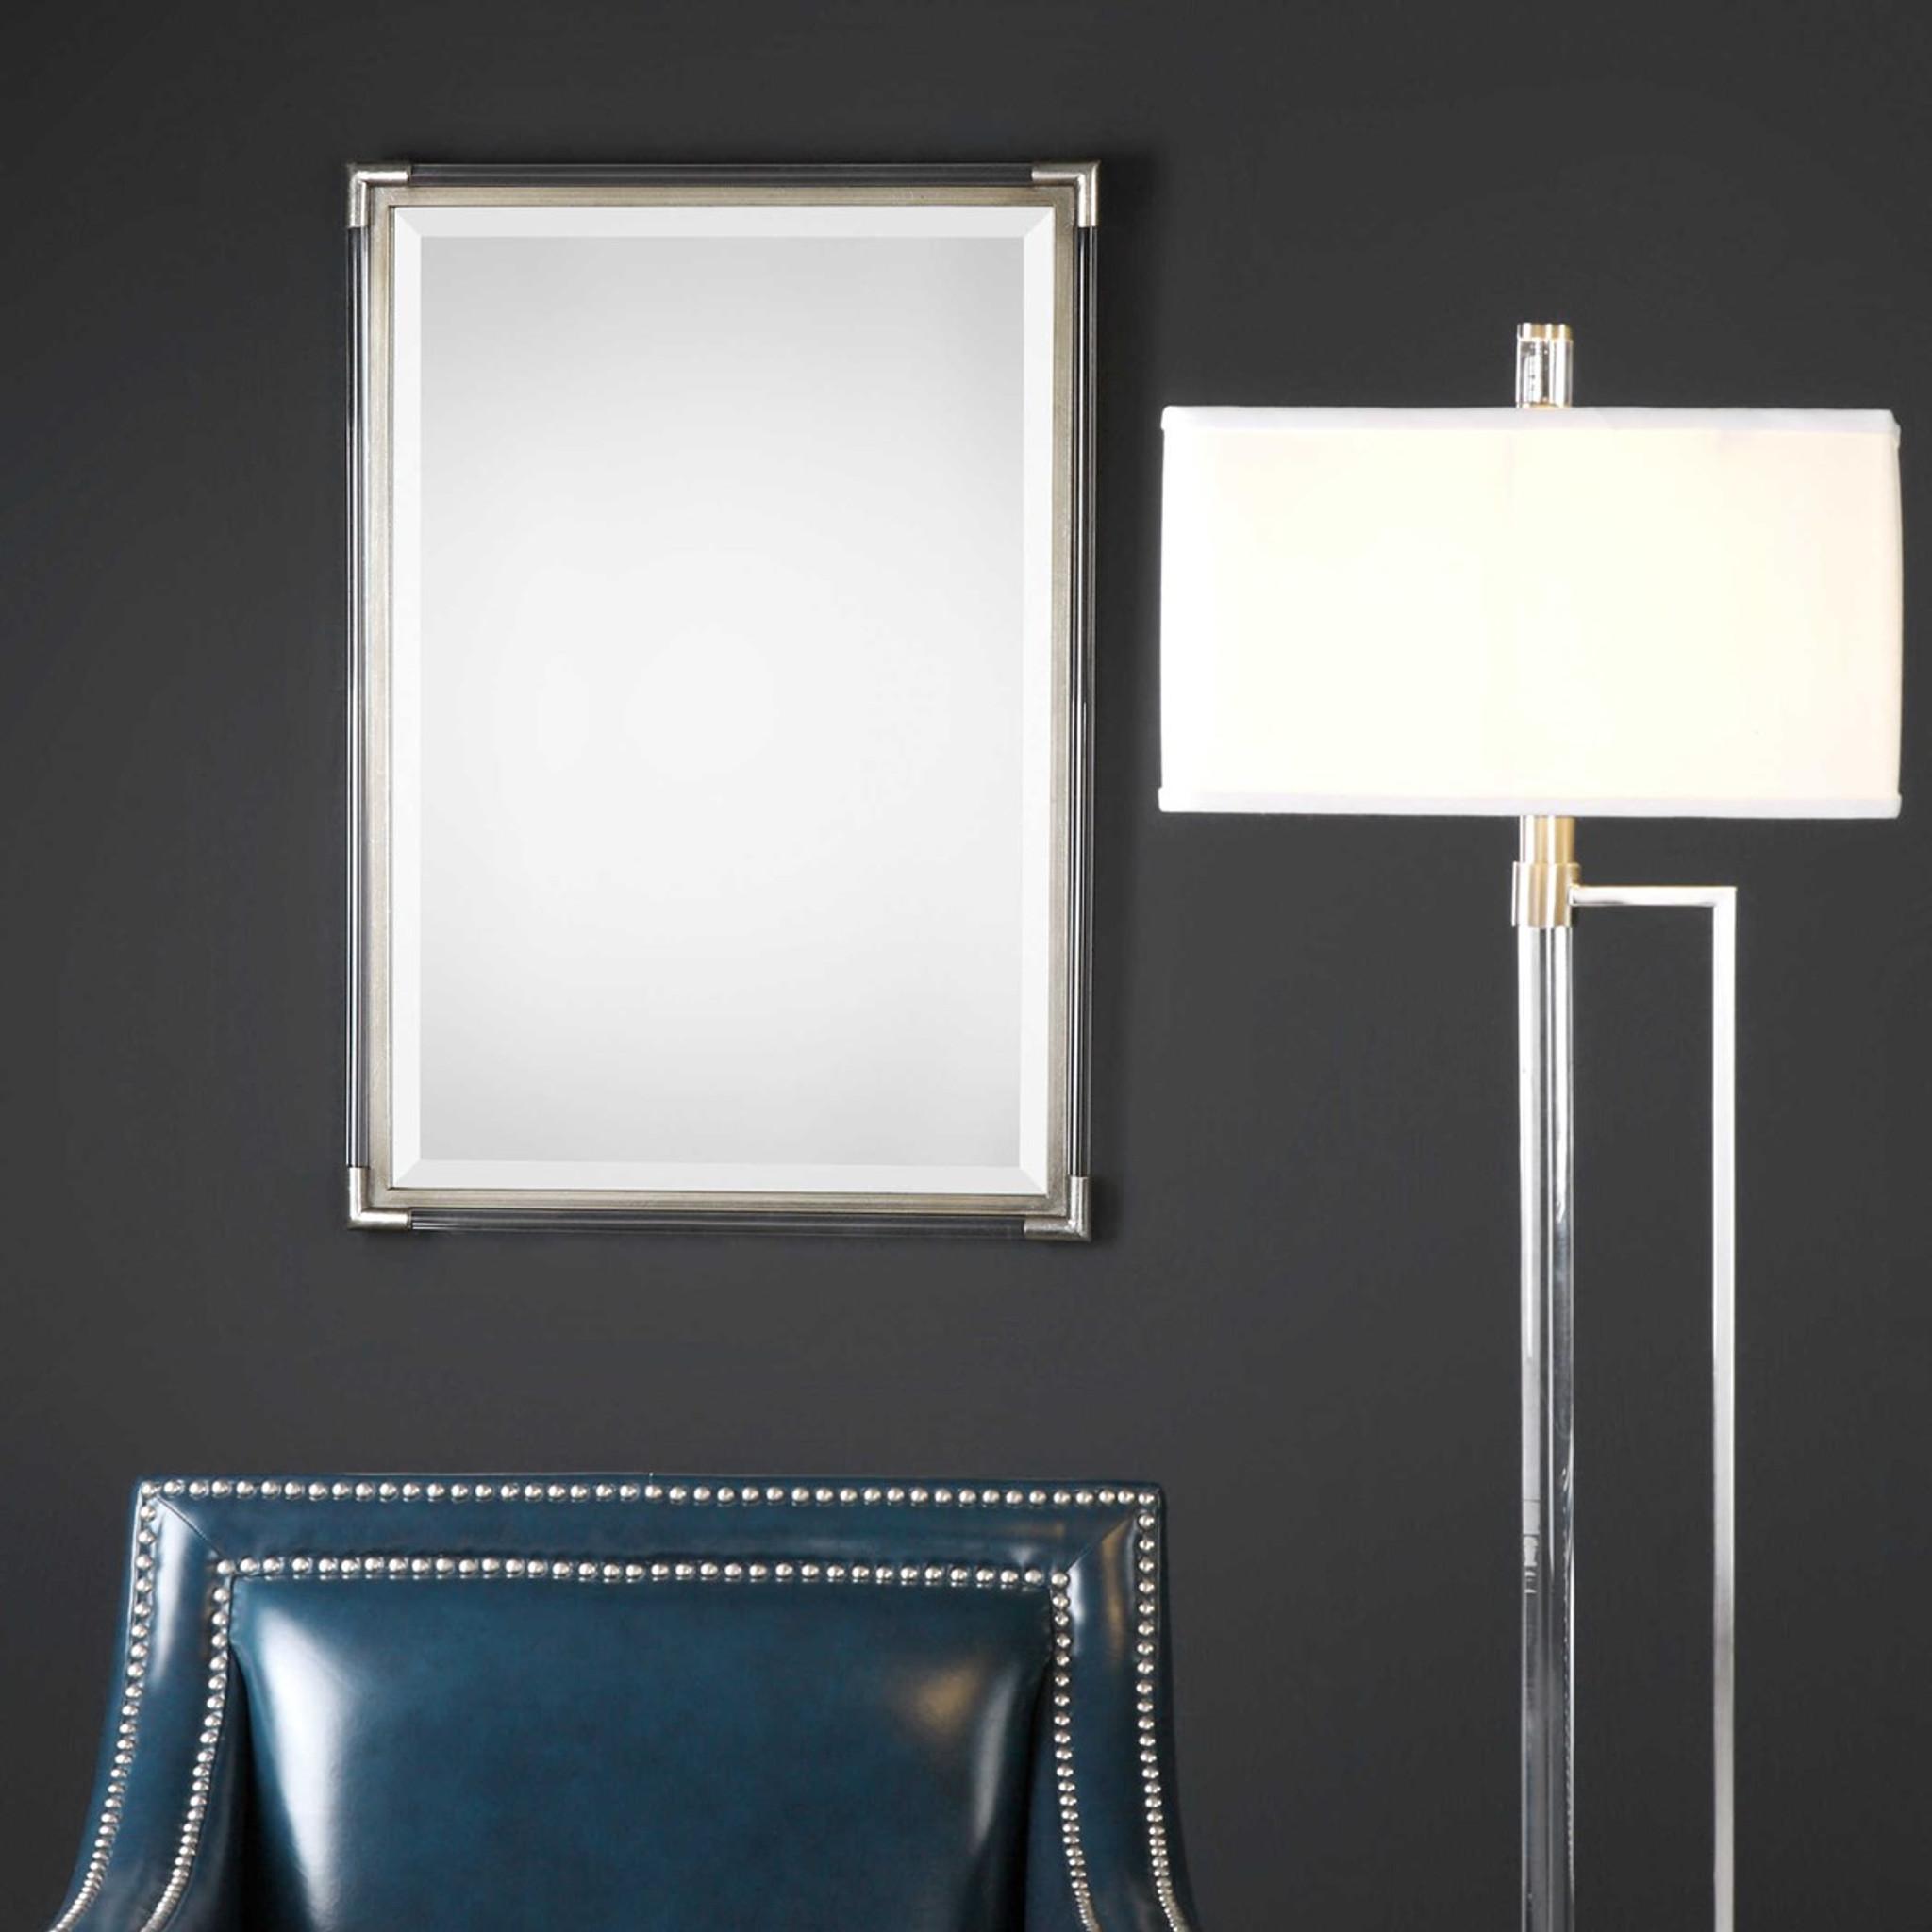 clear acrylic lucite silver rods modern decorative wall mirror uttermost mackai